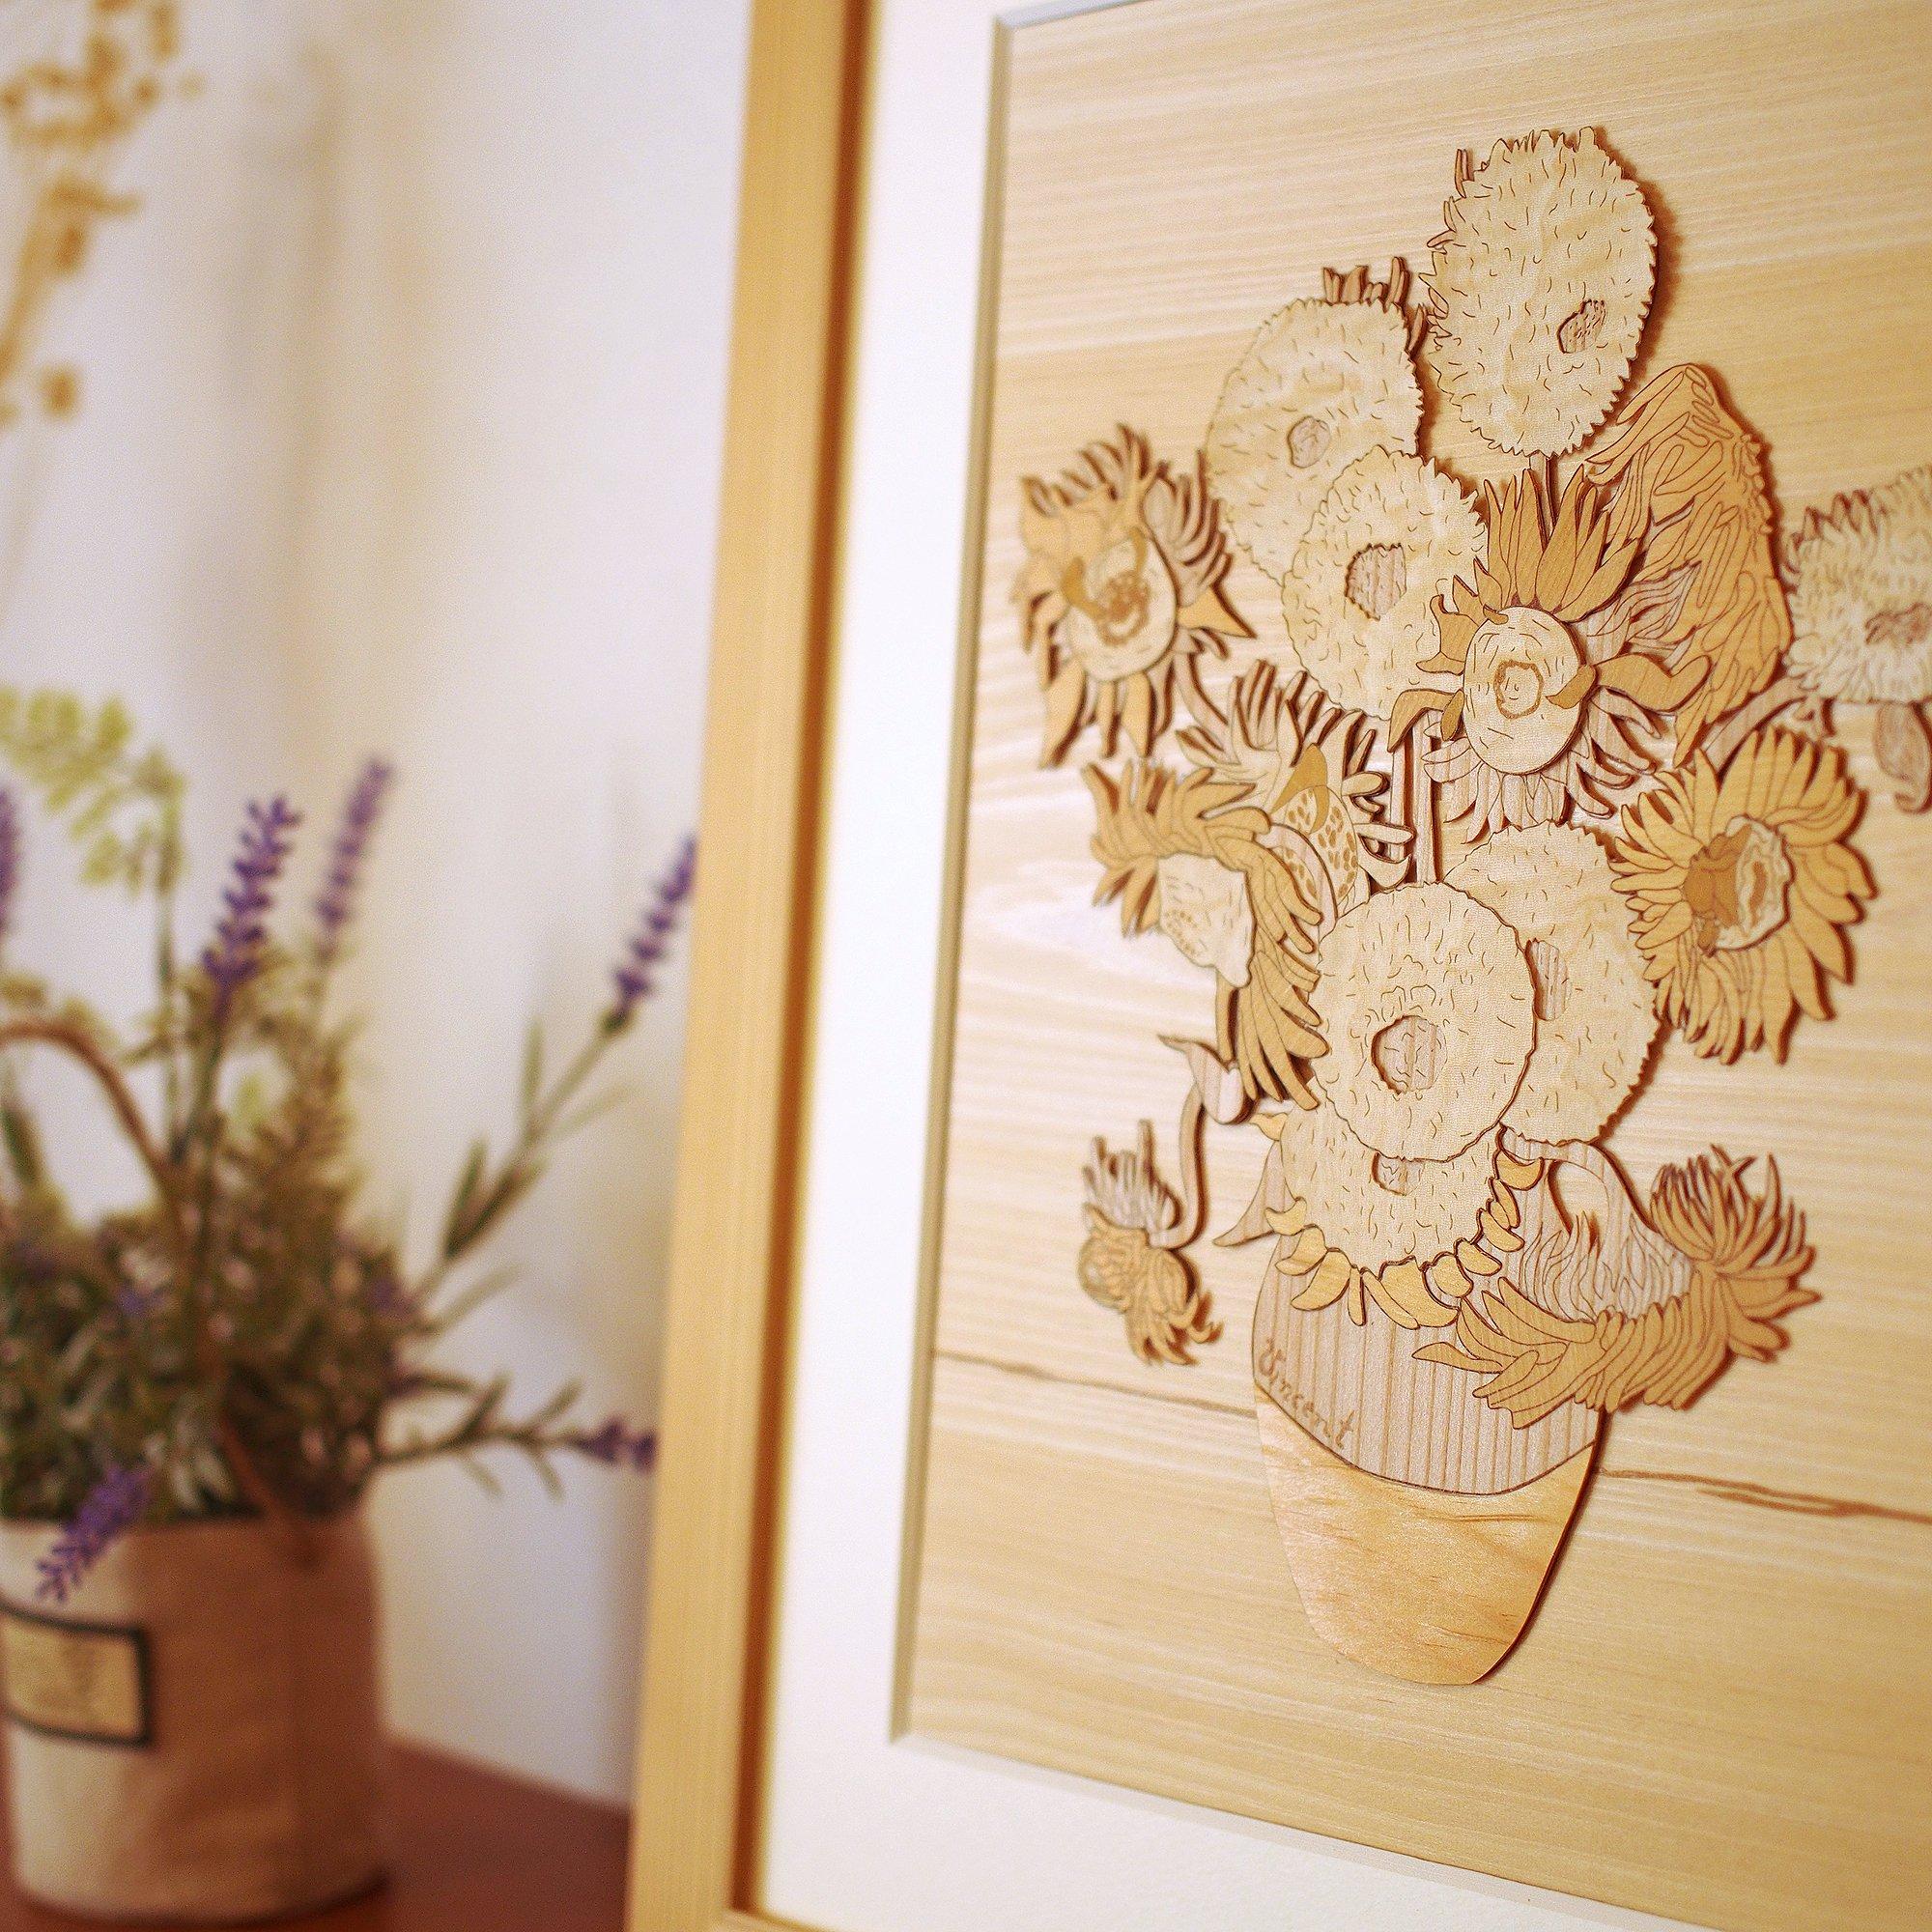 KINOWA Wooden Art Kit Kiharie Sunflowers Made in Japan by KINOWA (Image #7)